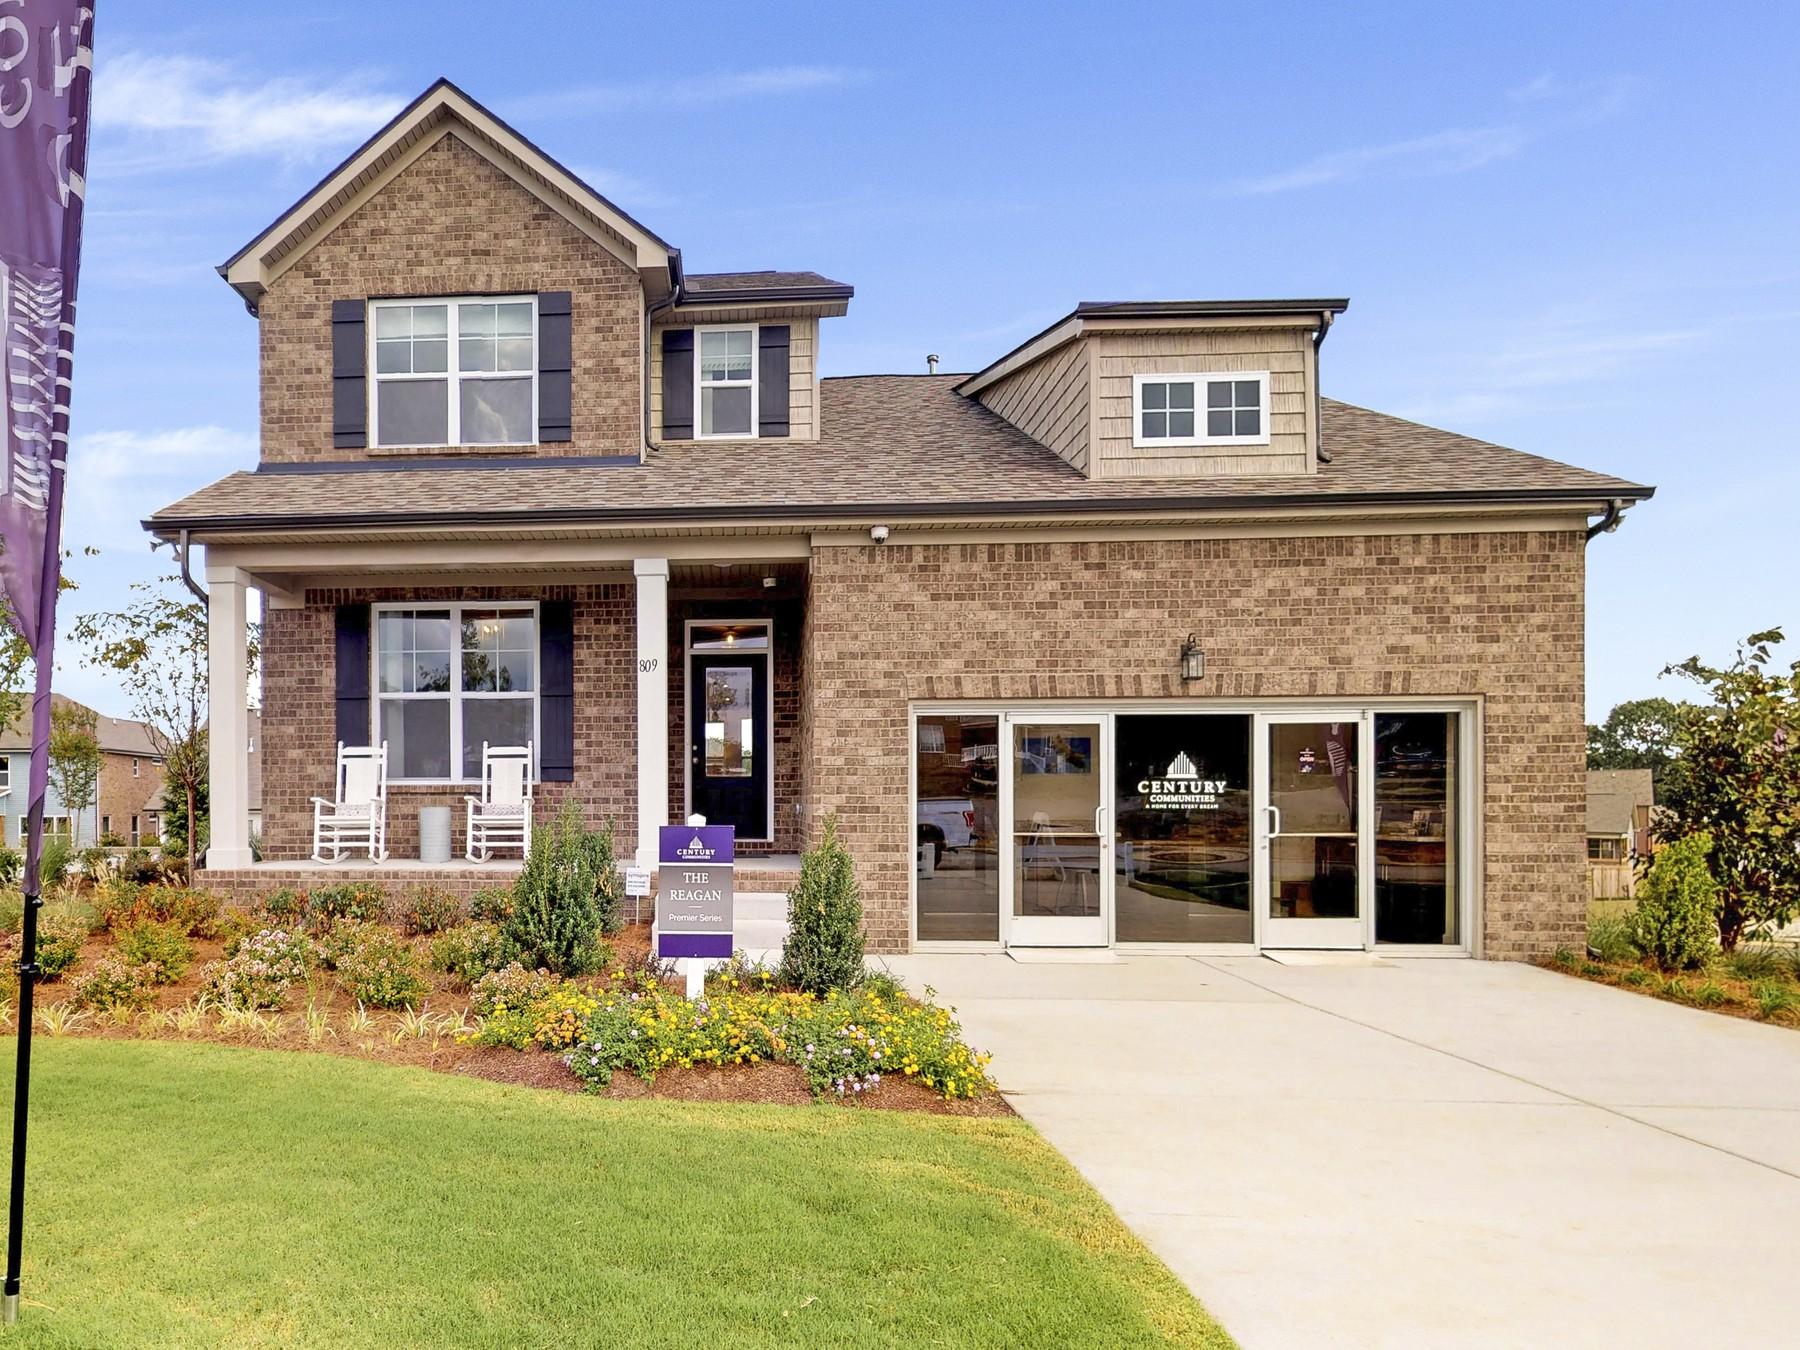 708 Lantana Drive Lot 166, Smyrna, TN 37167 - Smyrna, TN real estate listing